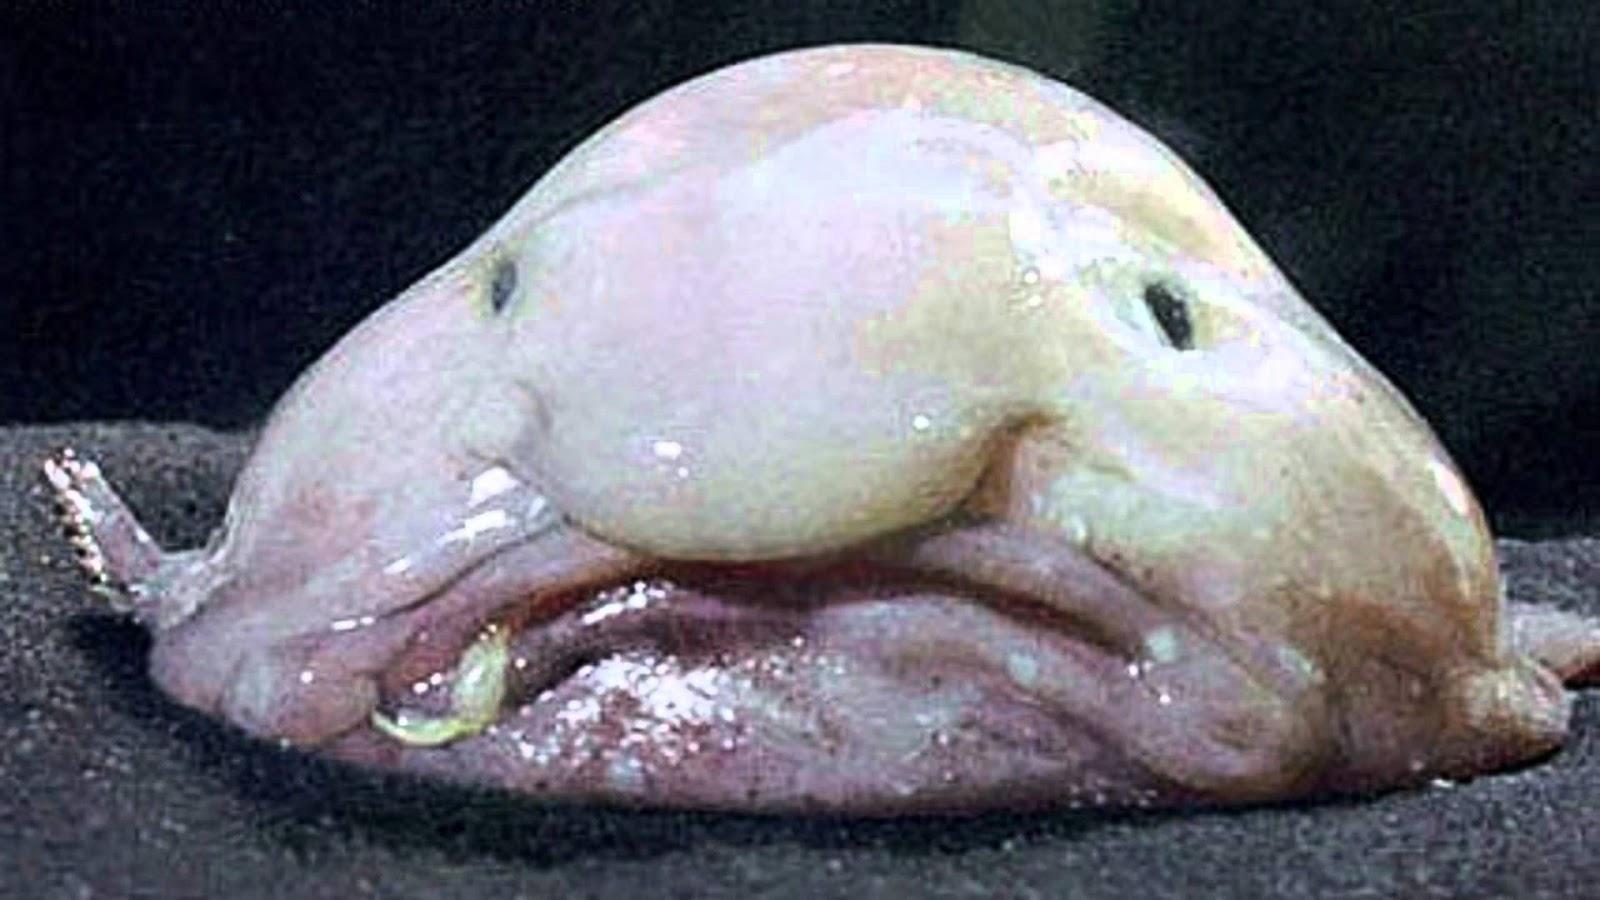 [Image: Blobfish2.jpg]